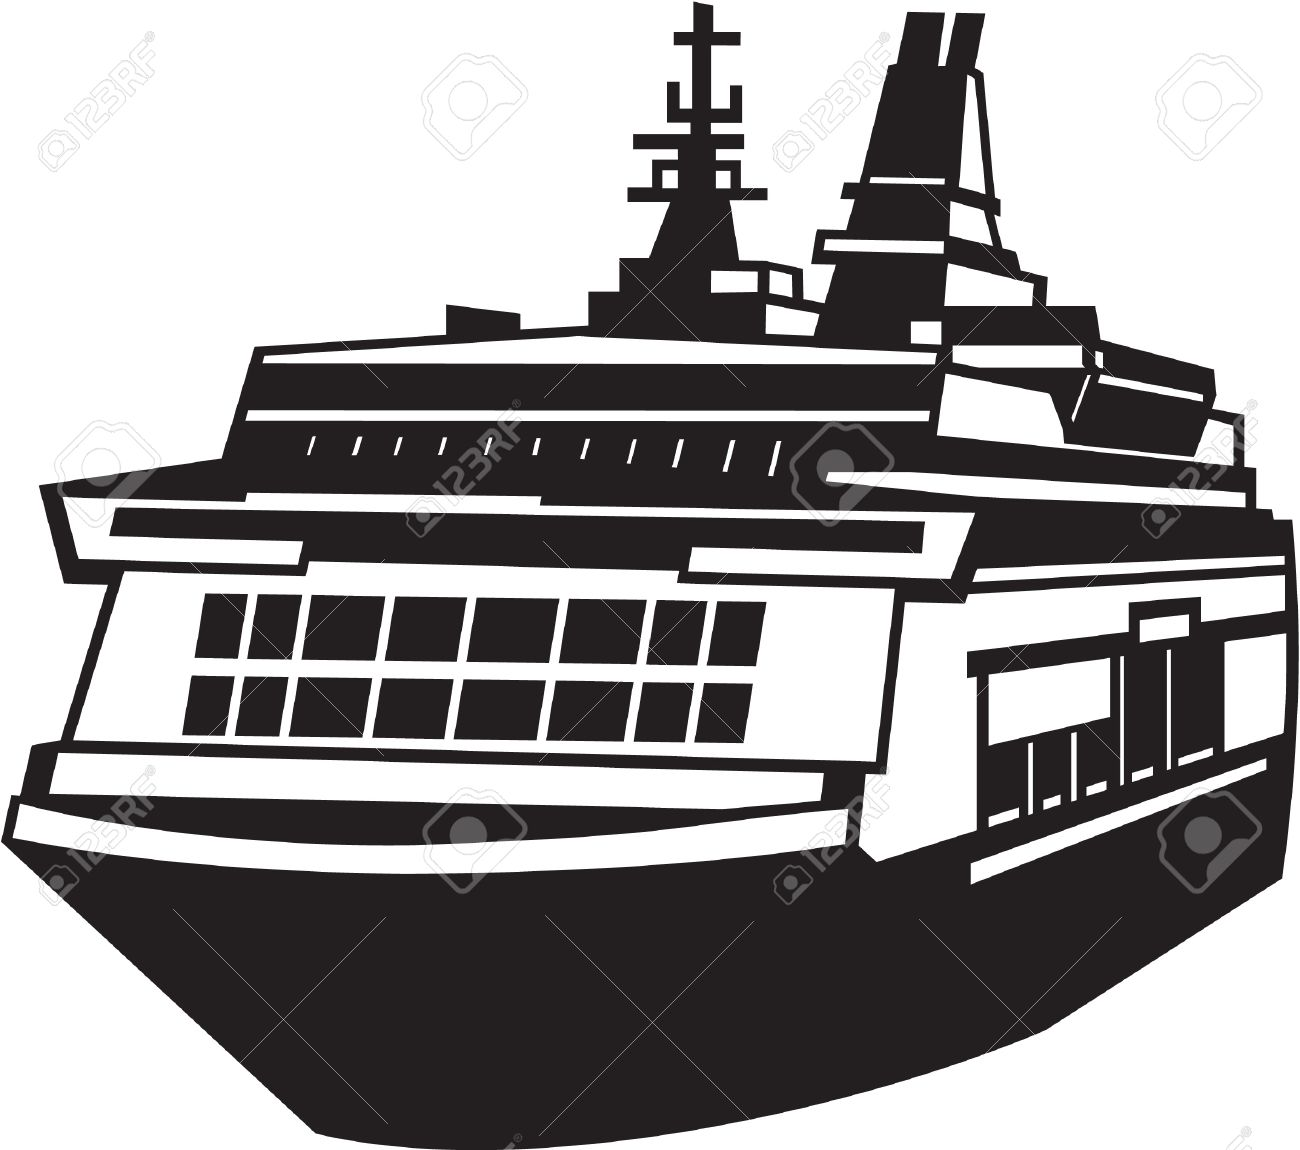 Ferry clipart black and white clip art stock Ferry clipart black and white 5 » Clipart Station clip art stock